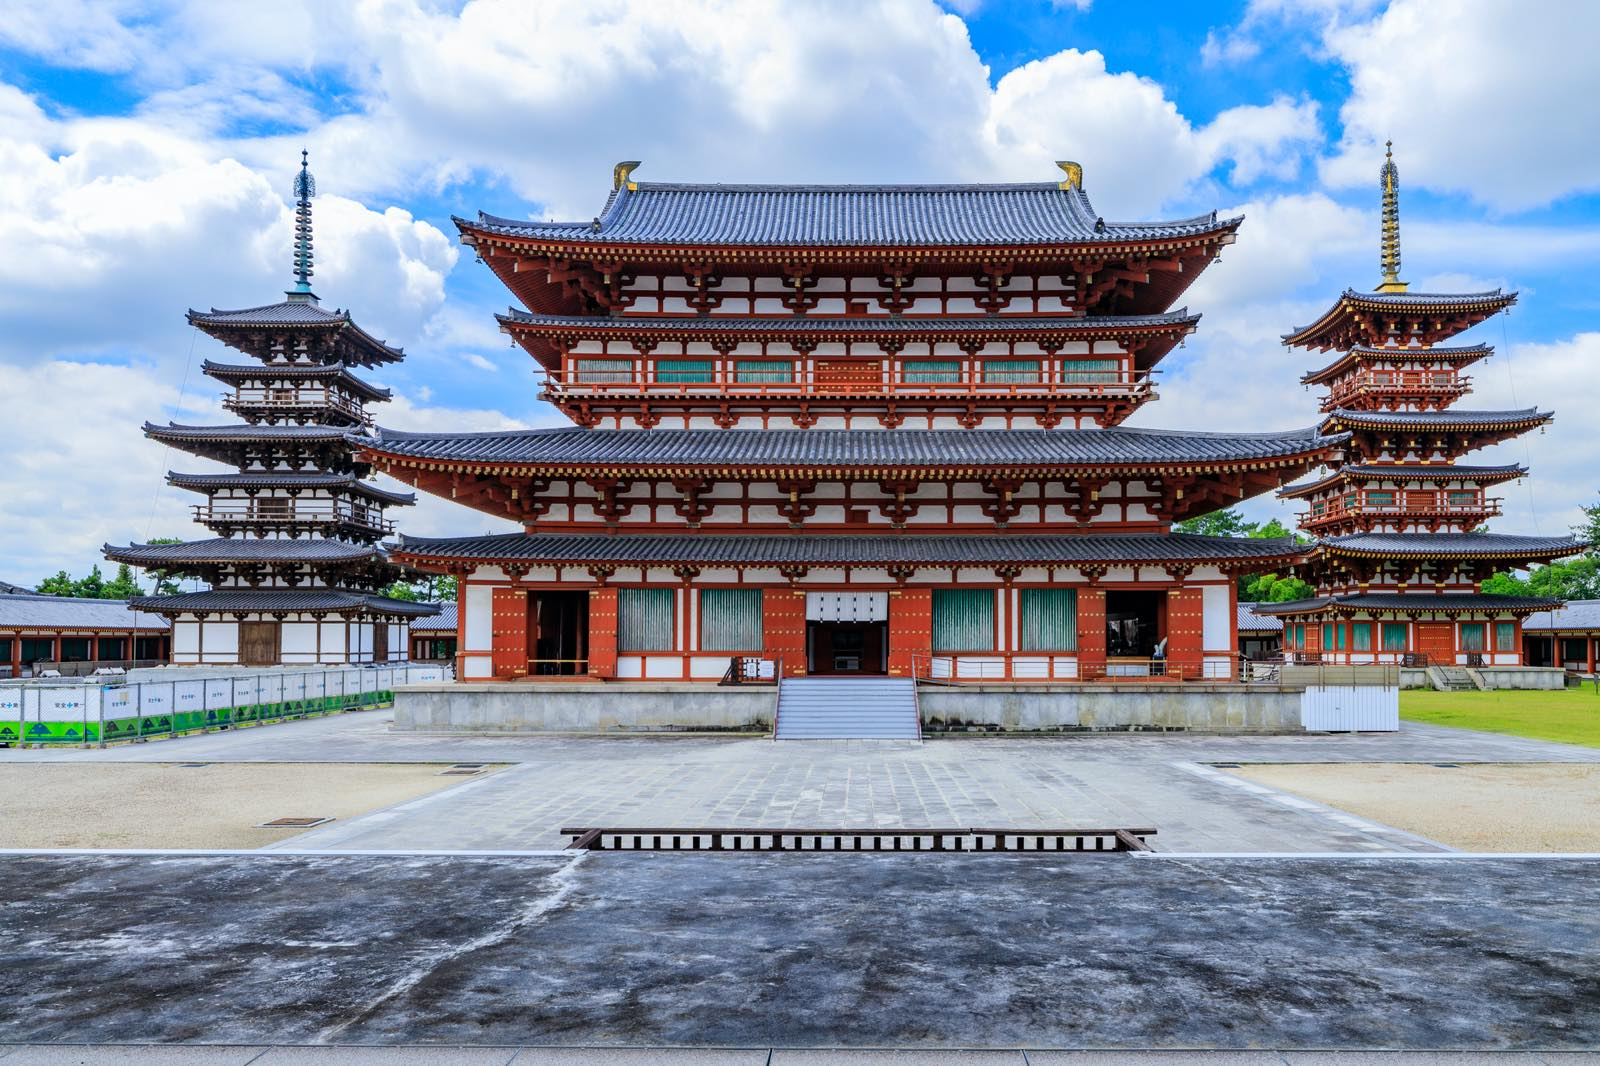 奈良県の薬師寺